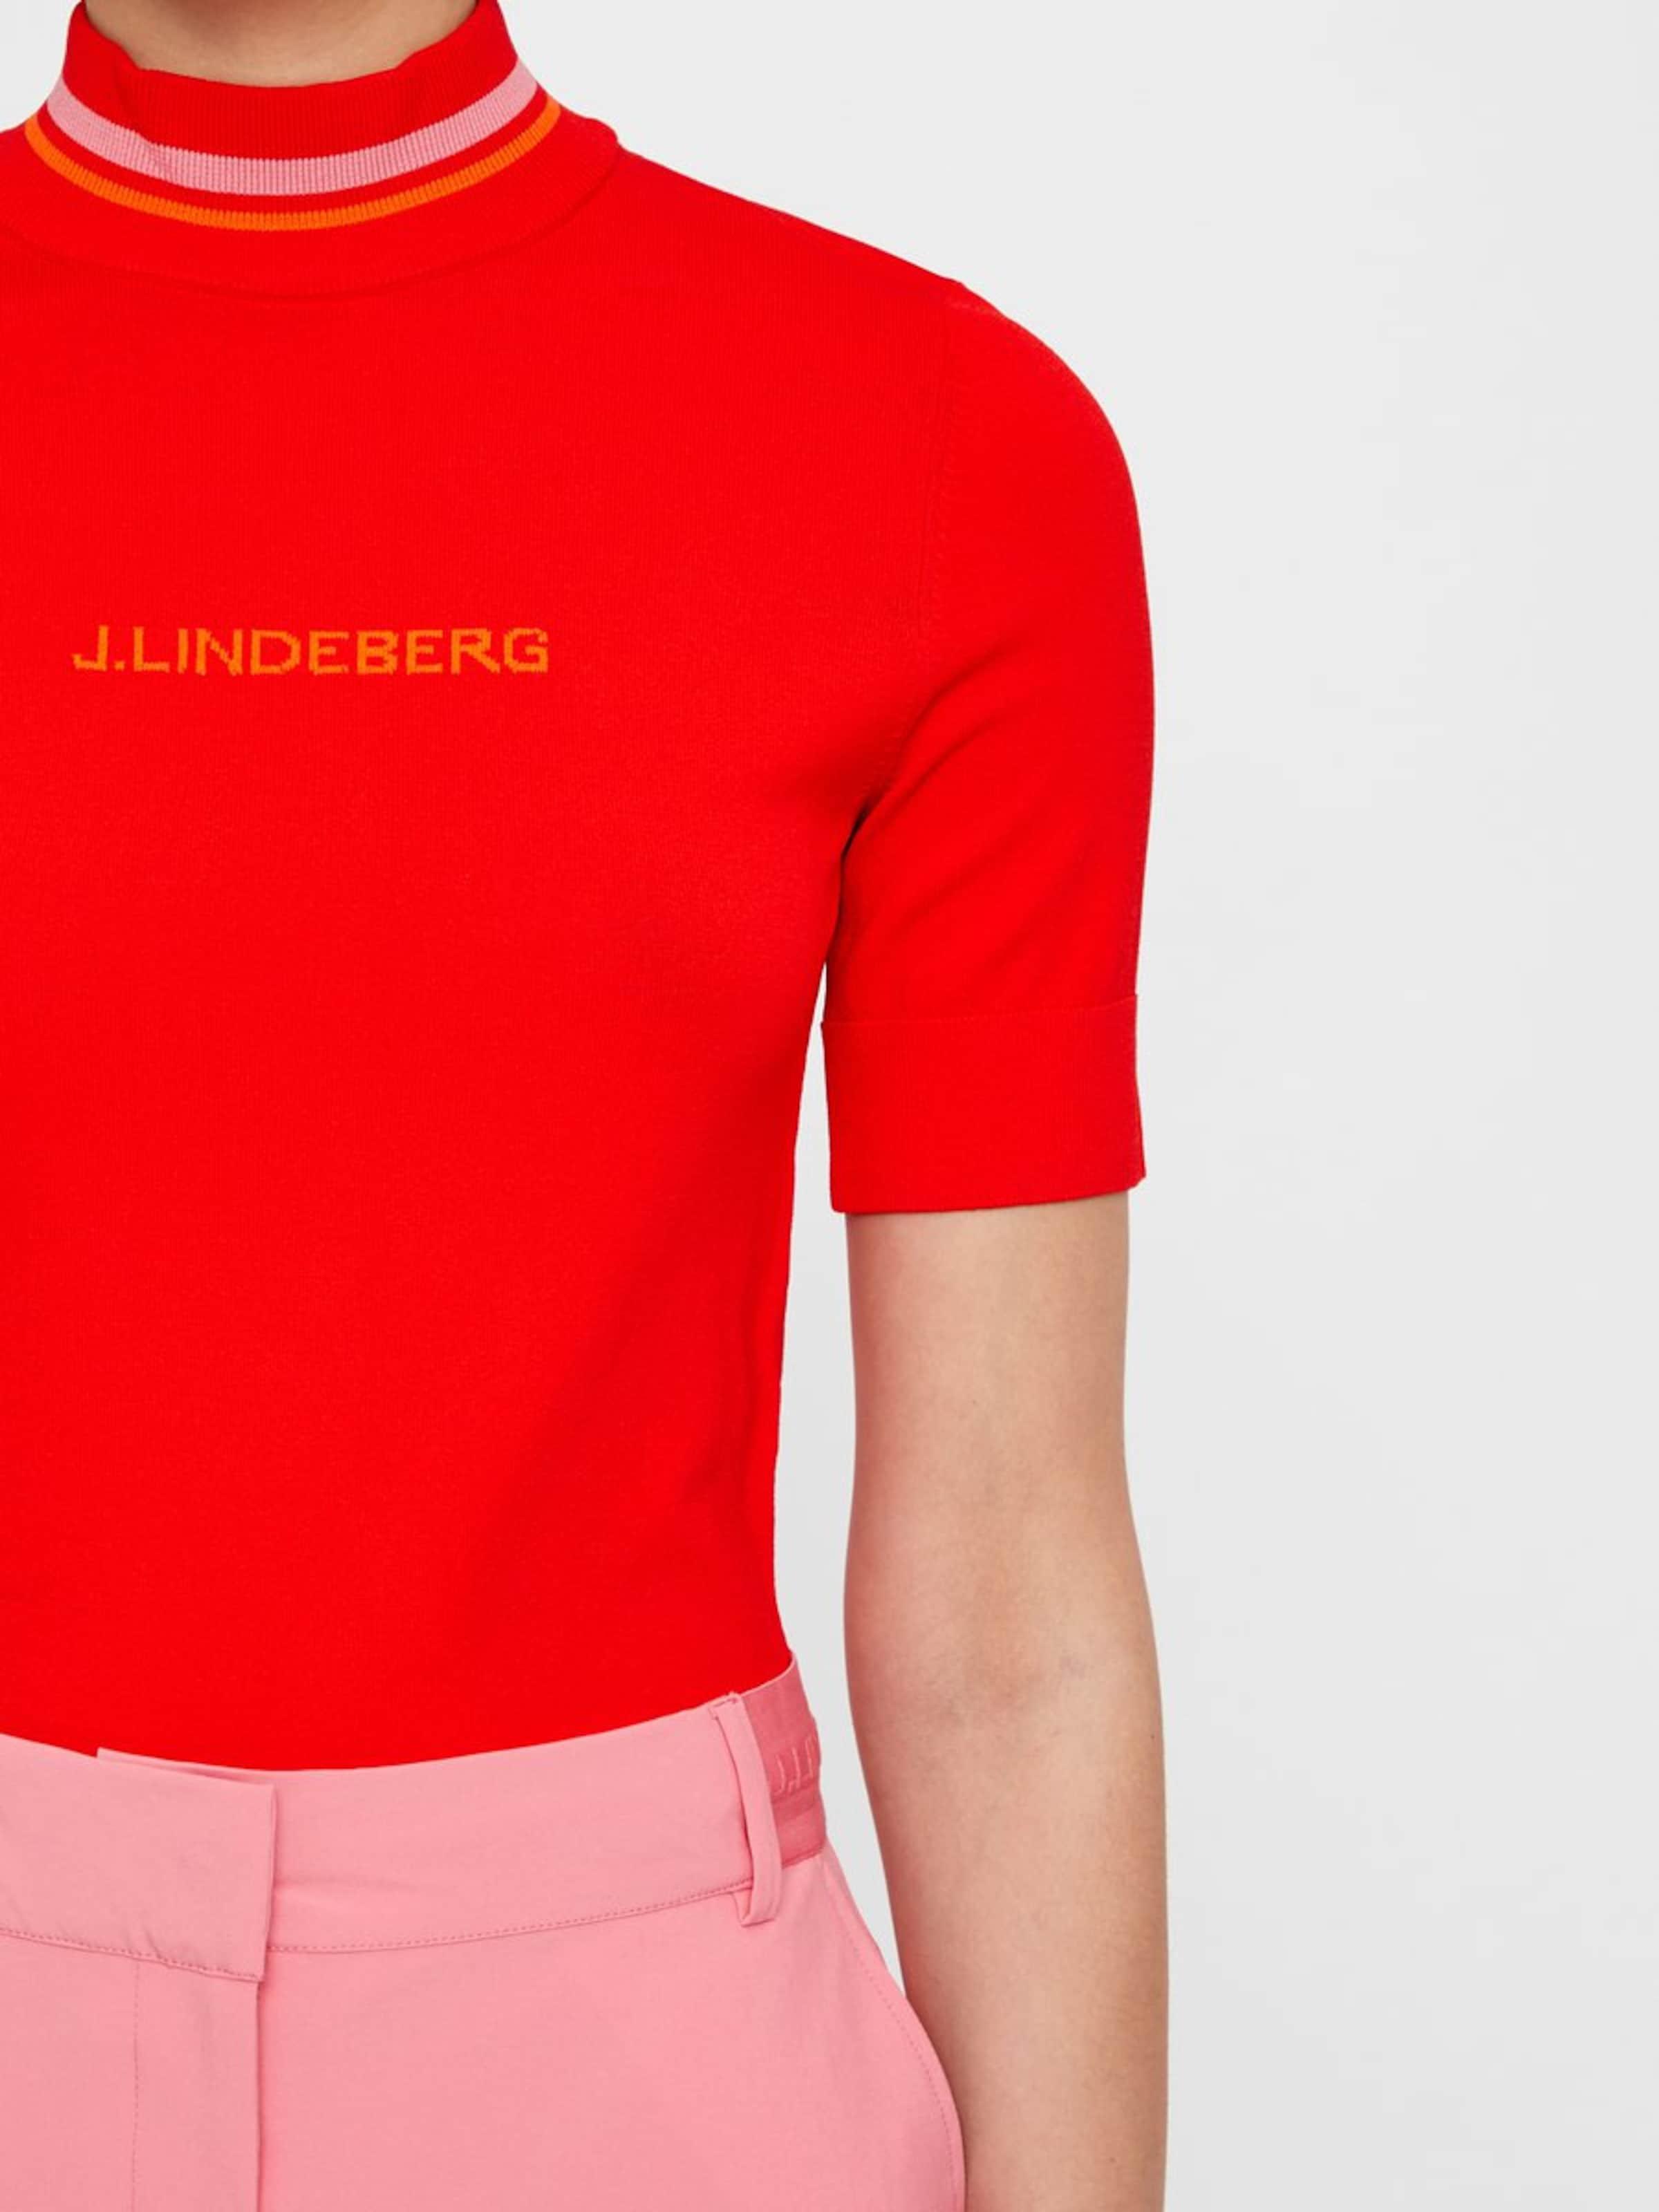 Clair 'selma' En shirt J OrangeRouge lindeberg T jLMGSzqUVp